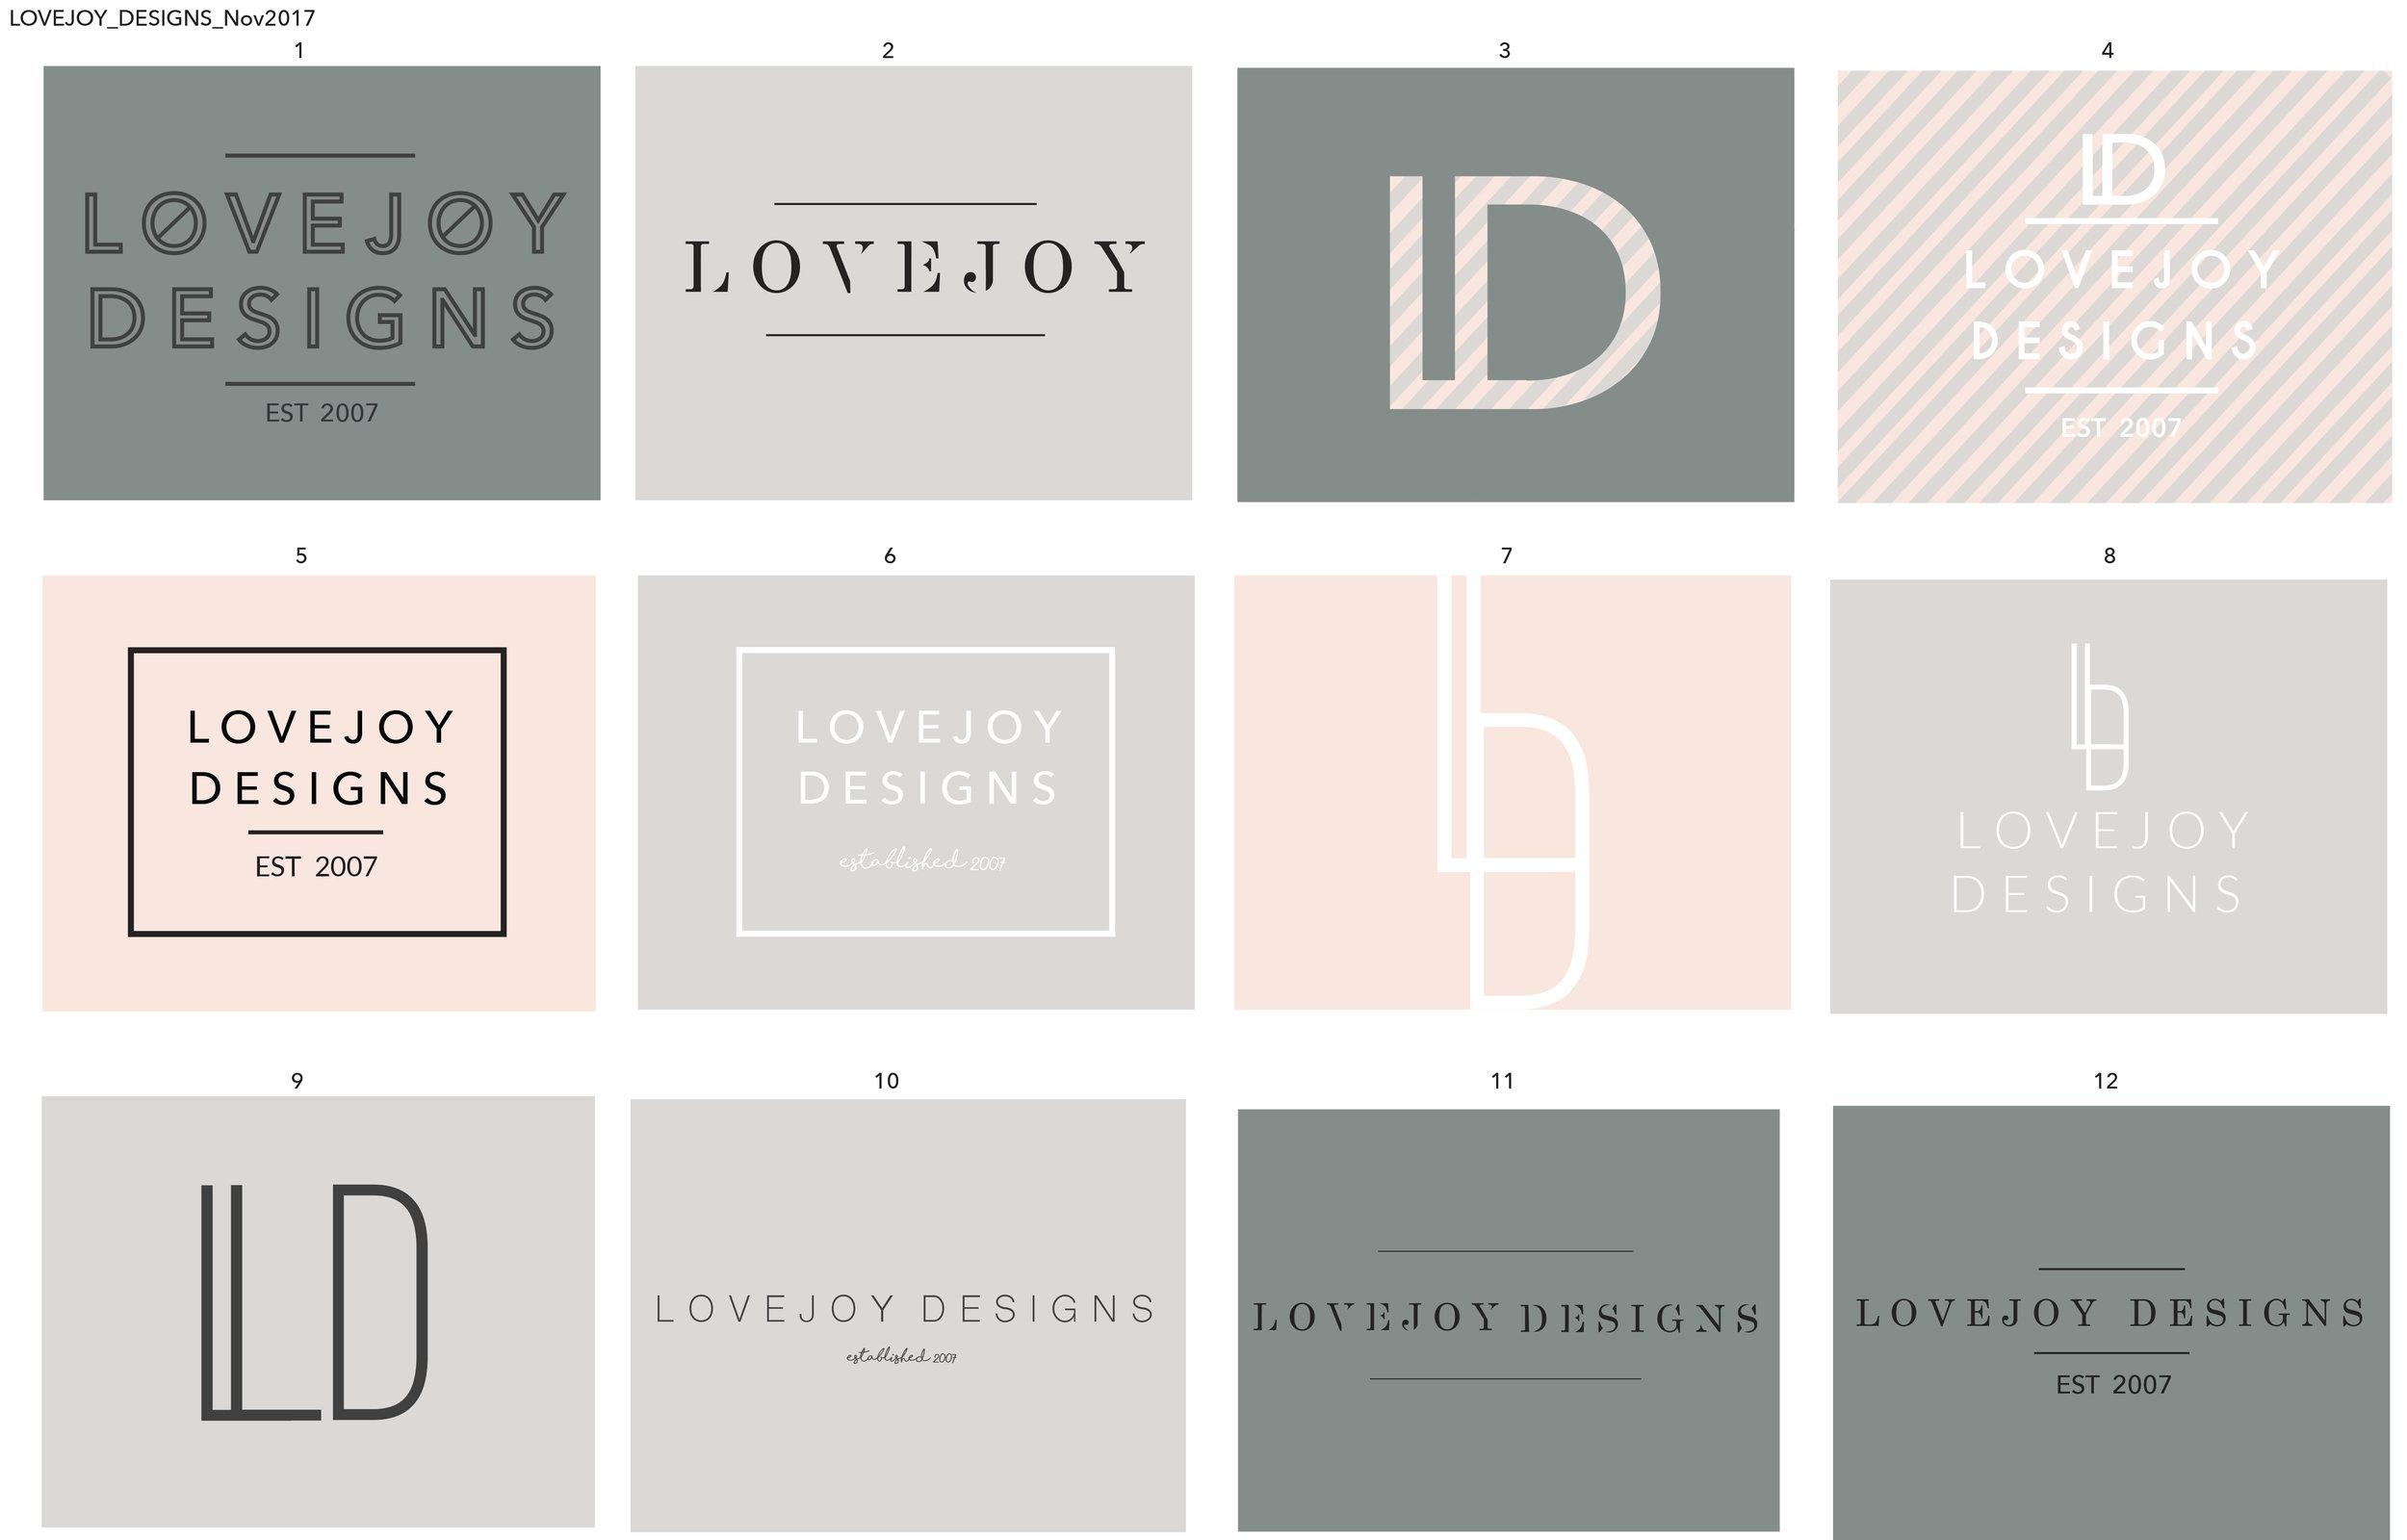 LovejoyDesigns1116.jpg